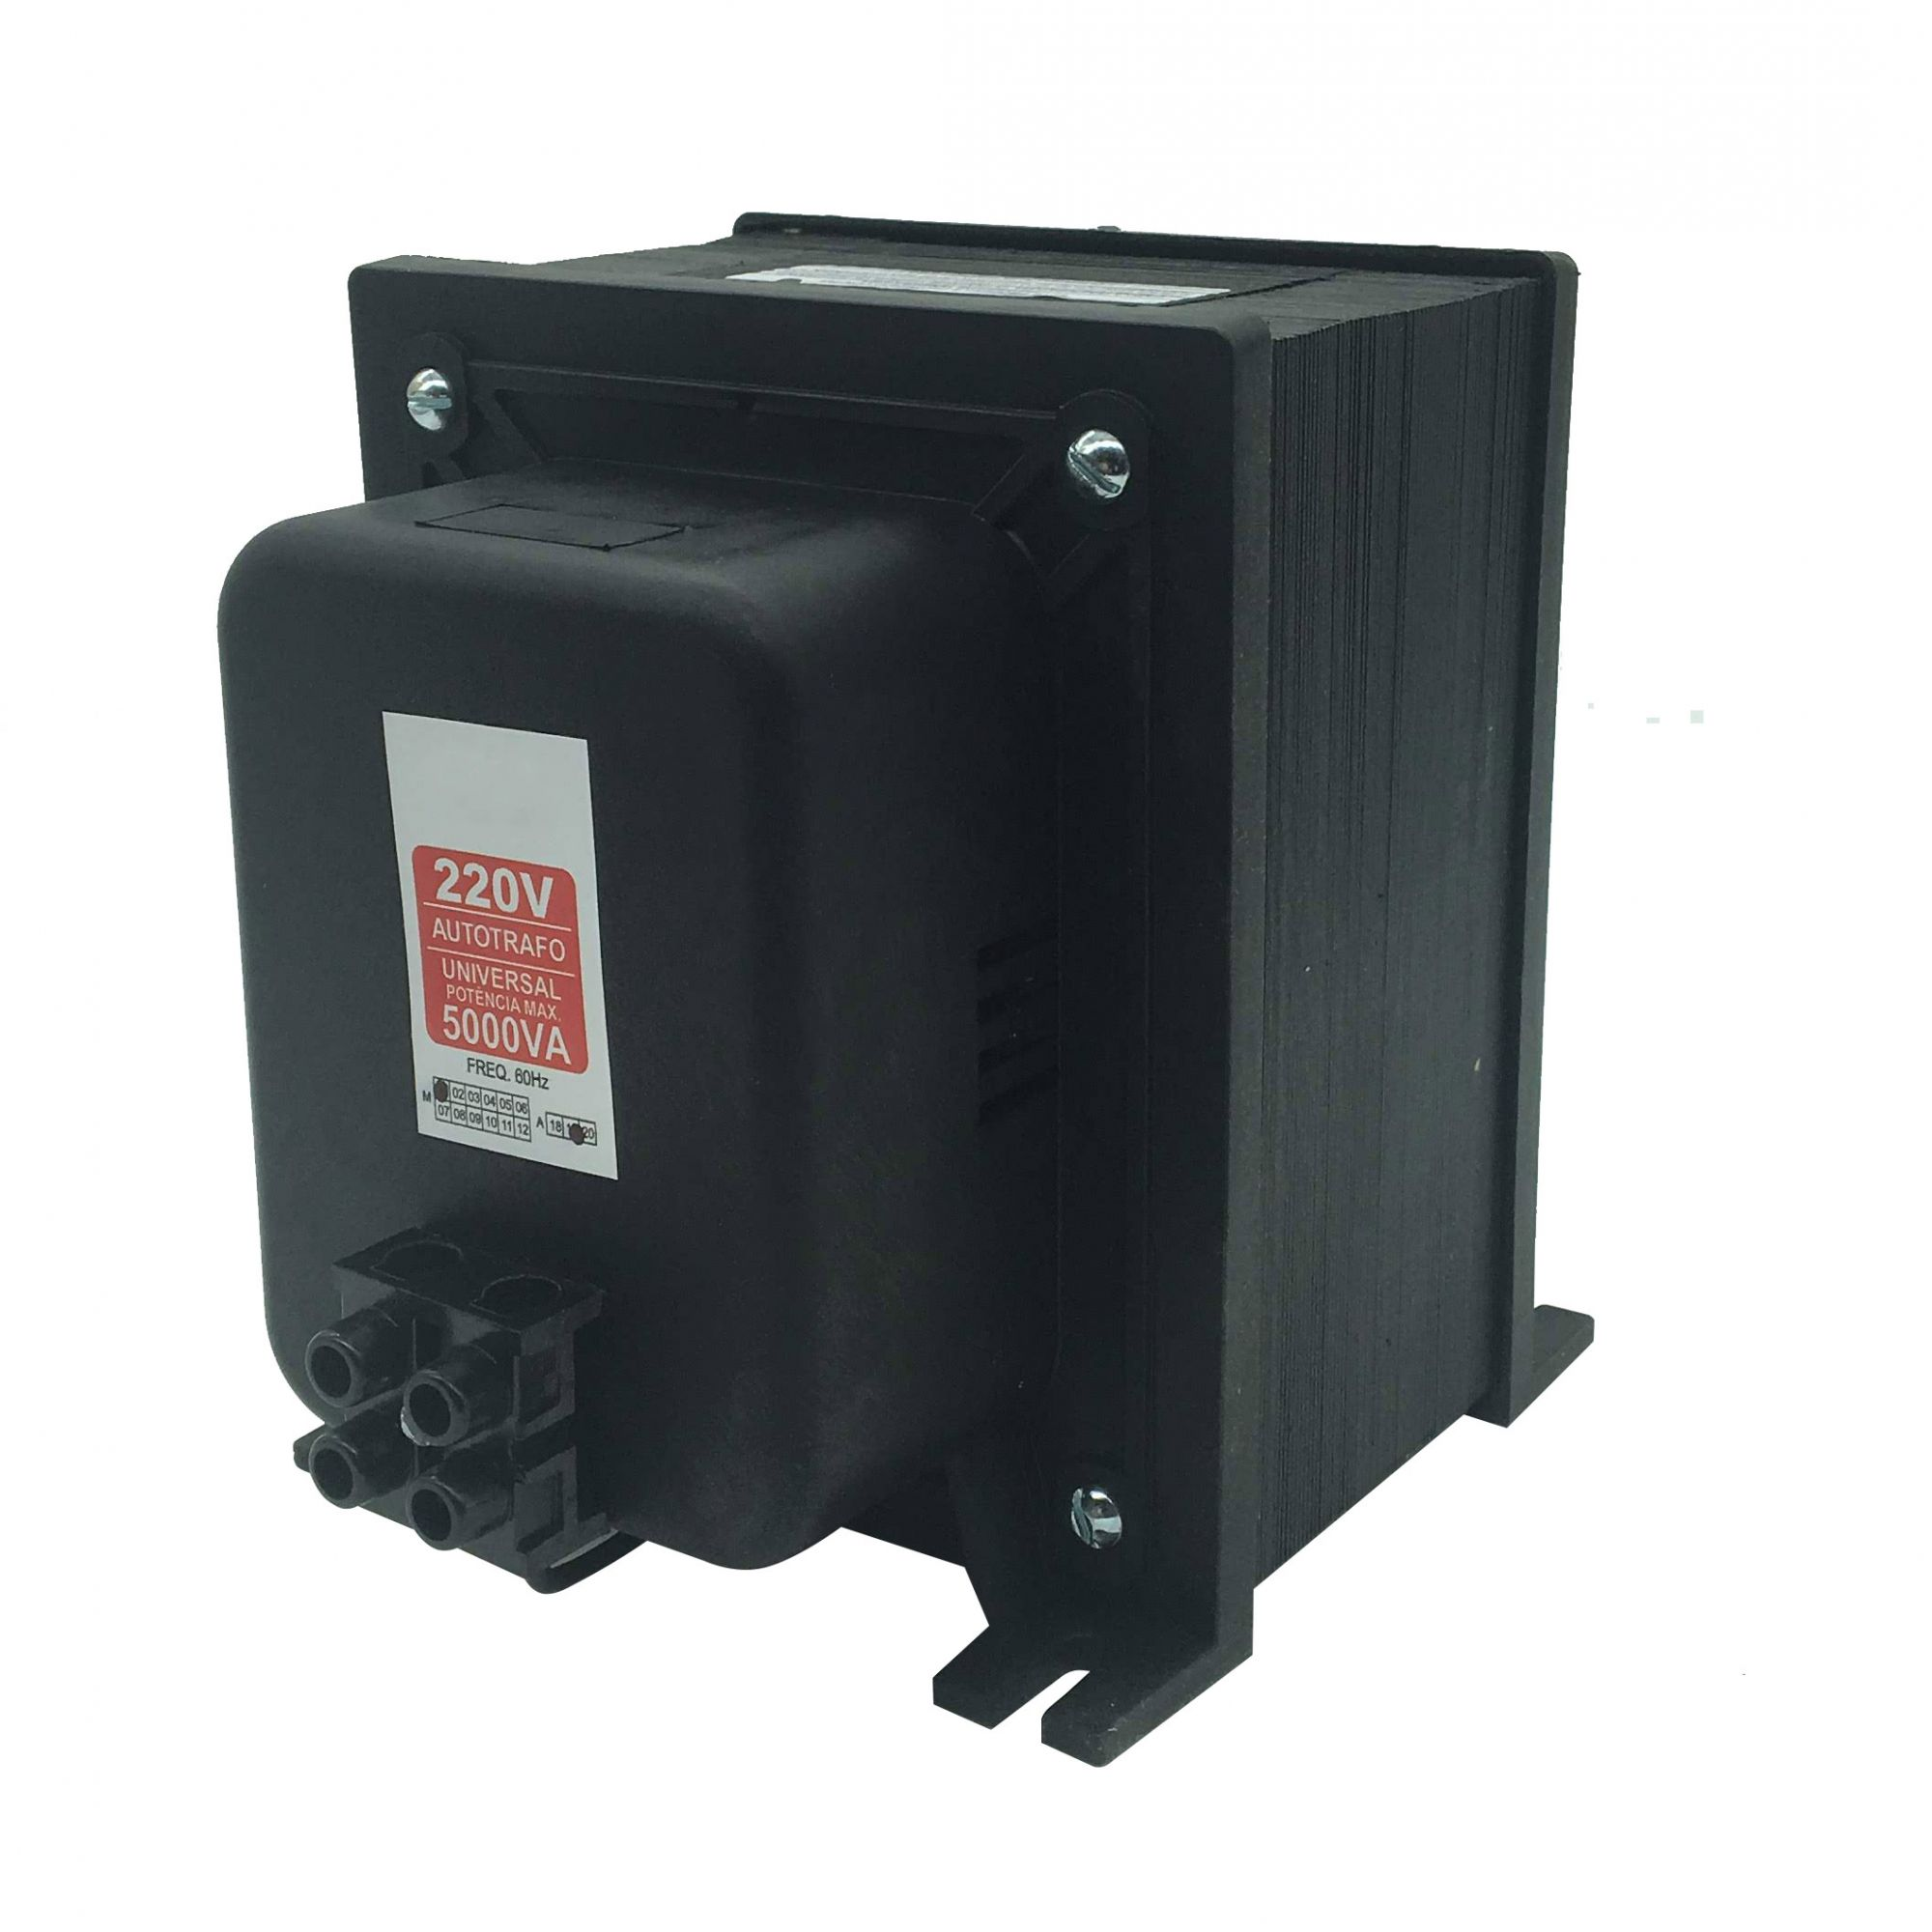 Autotransformador Automático 5000VA 110/220 220/110 - Bivolt